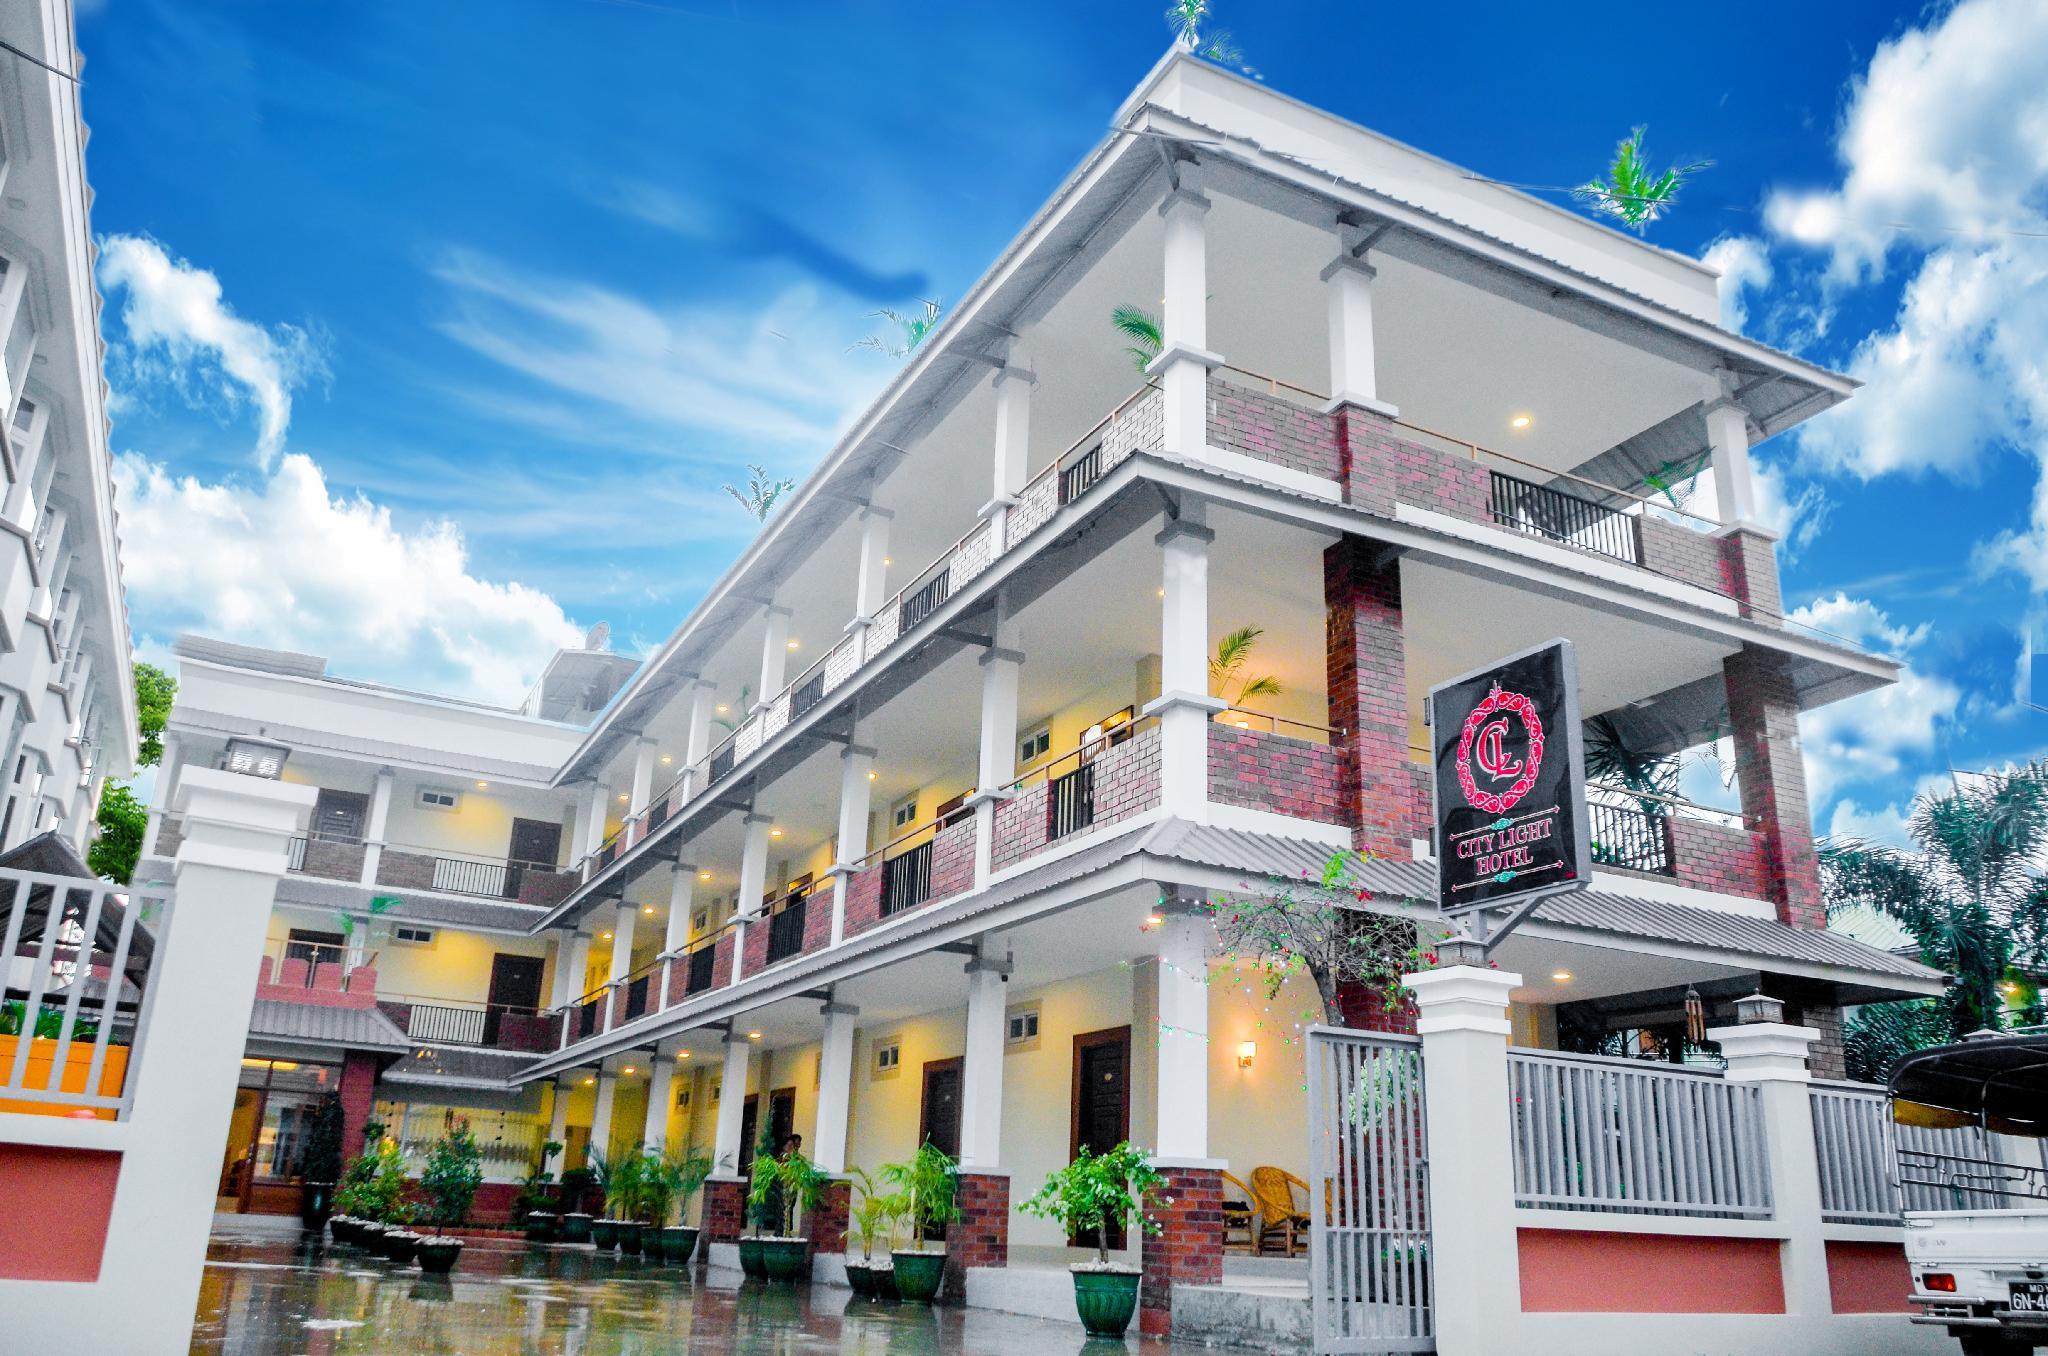 City Light Hotel